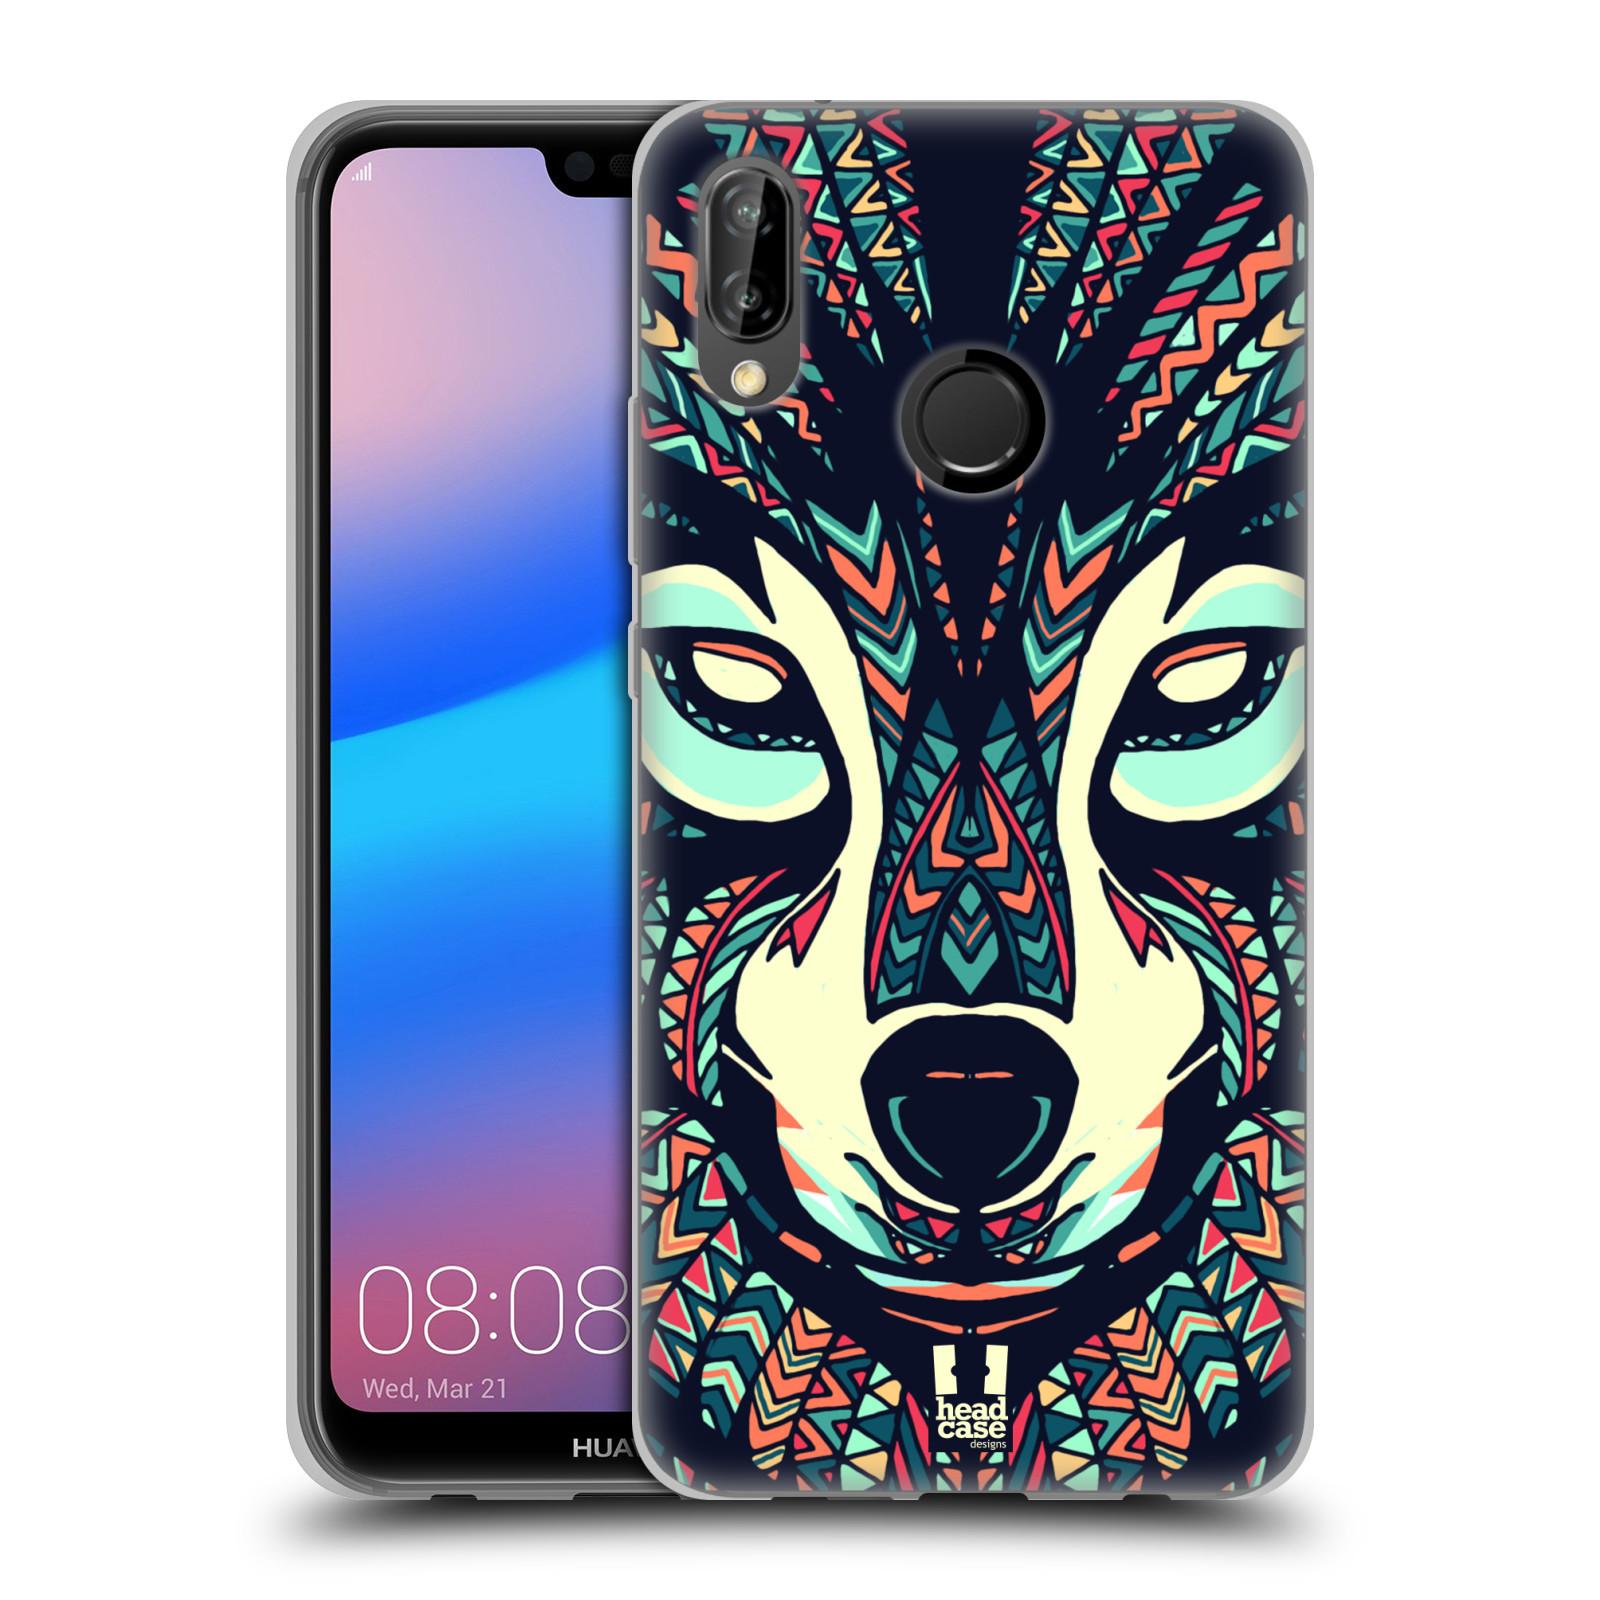 Silikonové pouzdro na mobil Huawei P20 Lite - Head Case - AZTEC VLK (Silikonový kryt či obal na mobilní telefon Huawei P20 Lite Dual SIM s motivem AZTEC VLK)